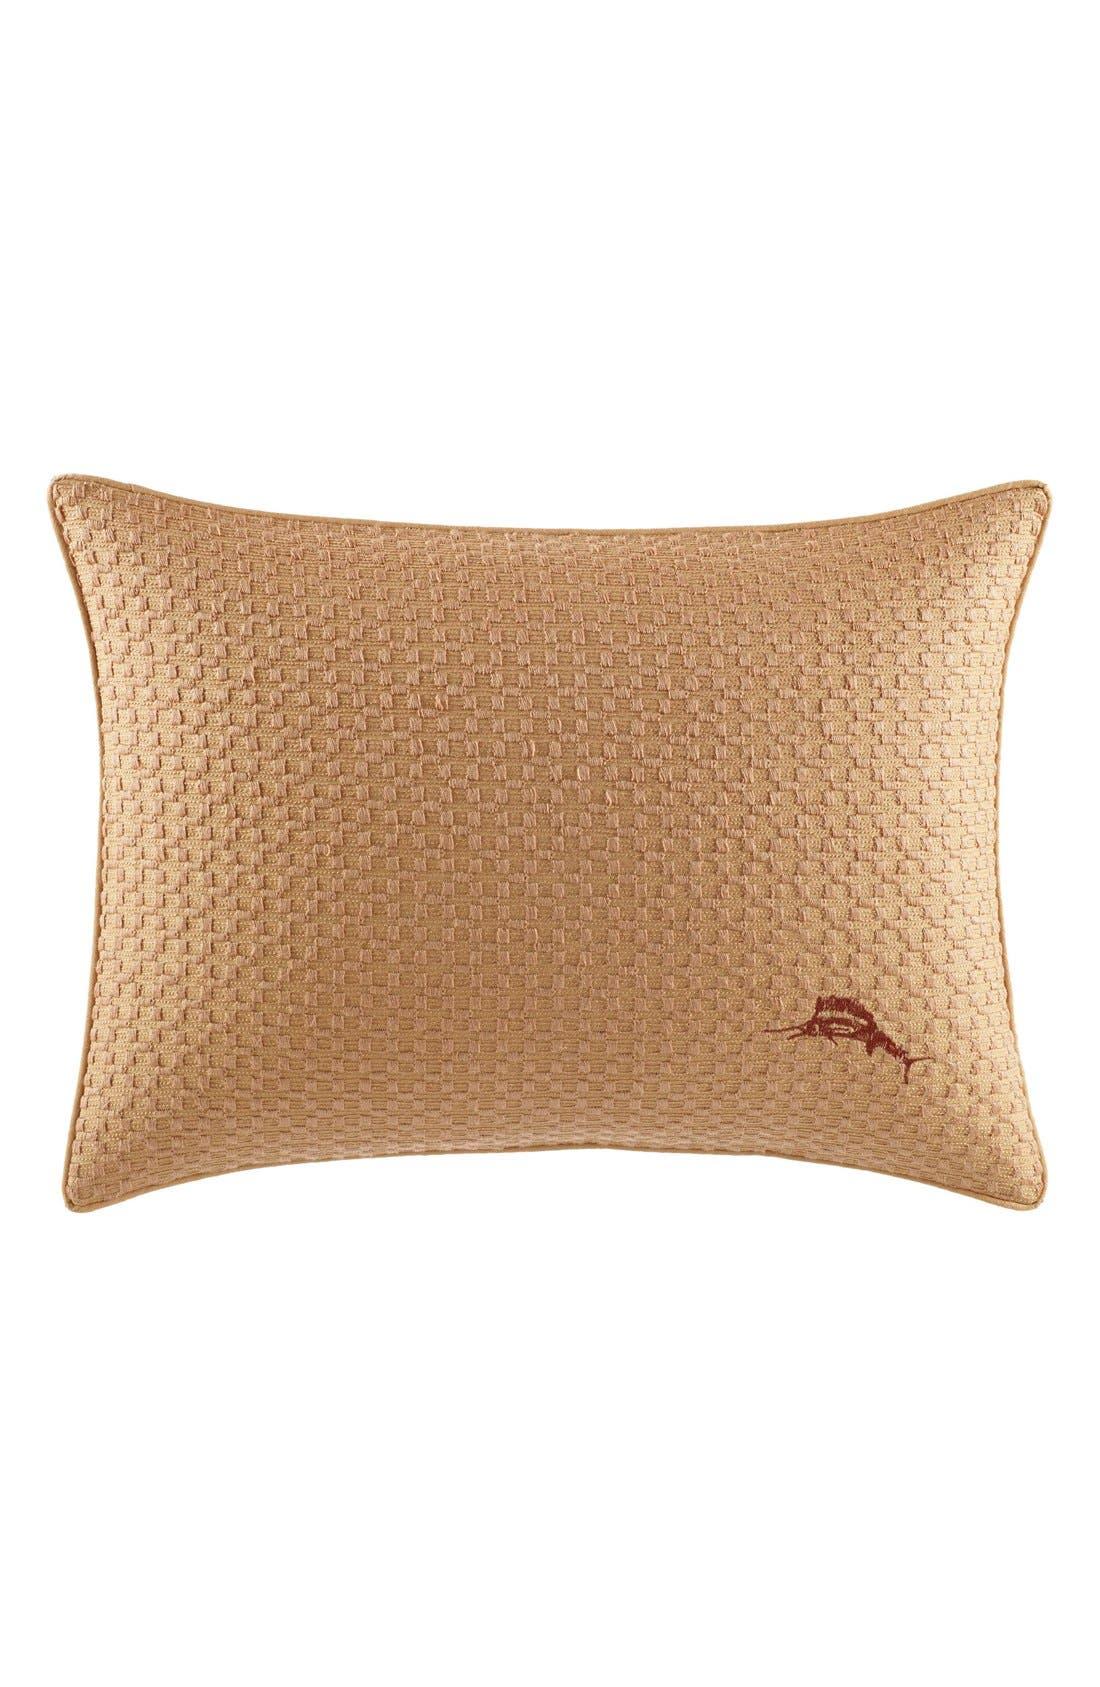 Cayo Coco Pillow,                         Main,                         color, 200